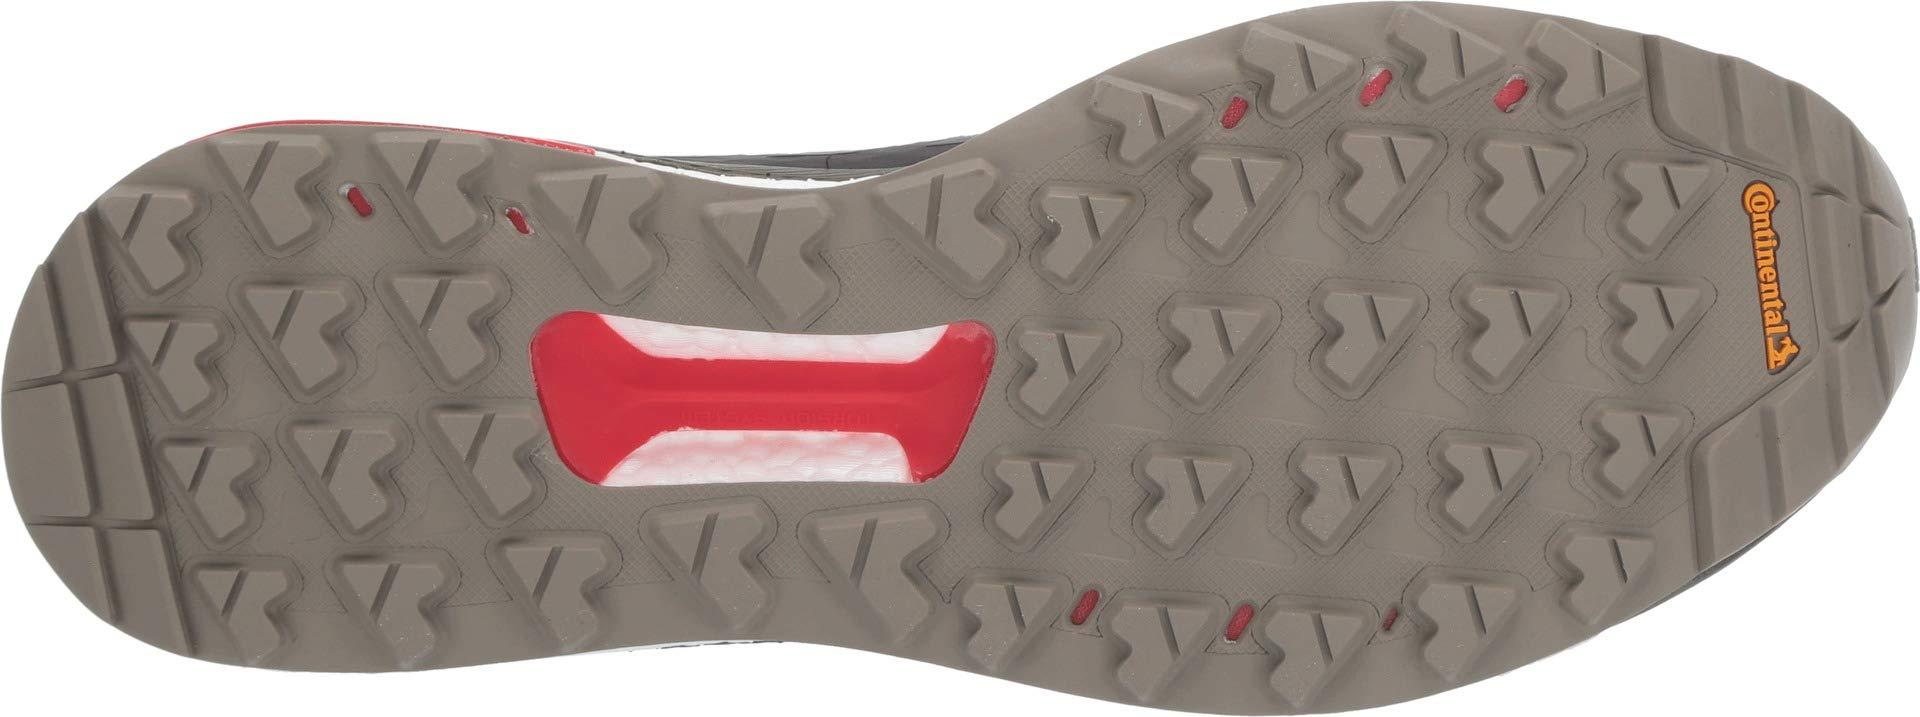 adidas outdoor Terrex Free Hiker Boot - Men's Black/Grey Six/Night Cargo, 7.5 by adidas outdoor (Image #3)